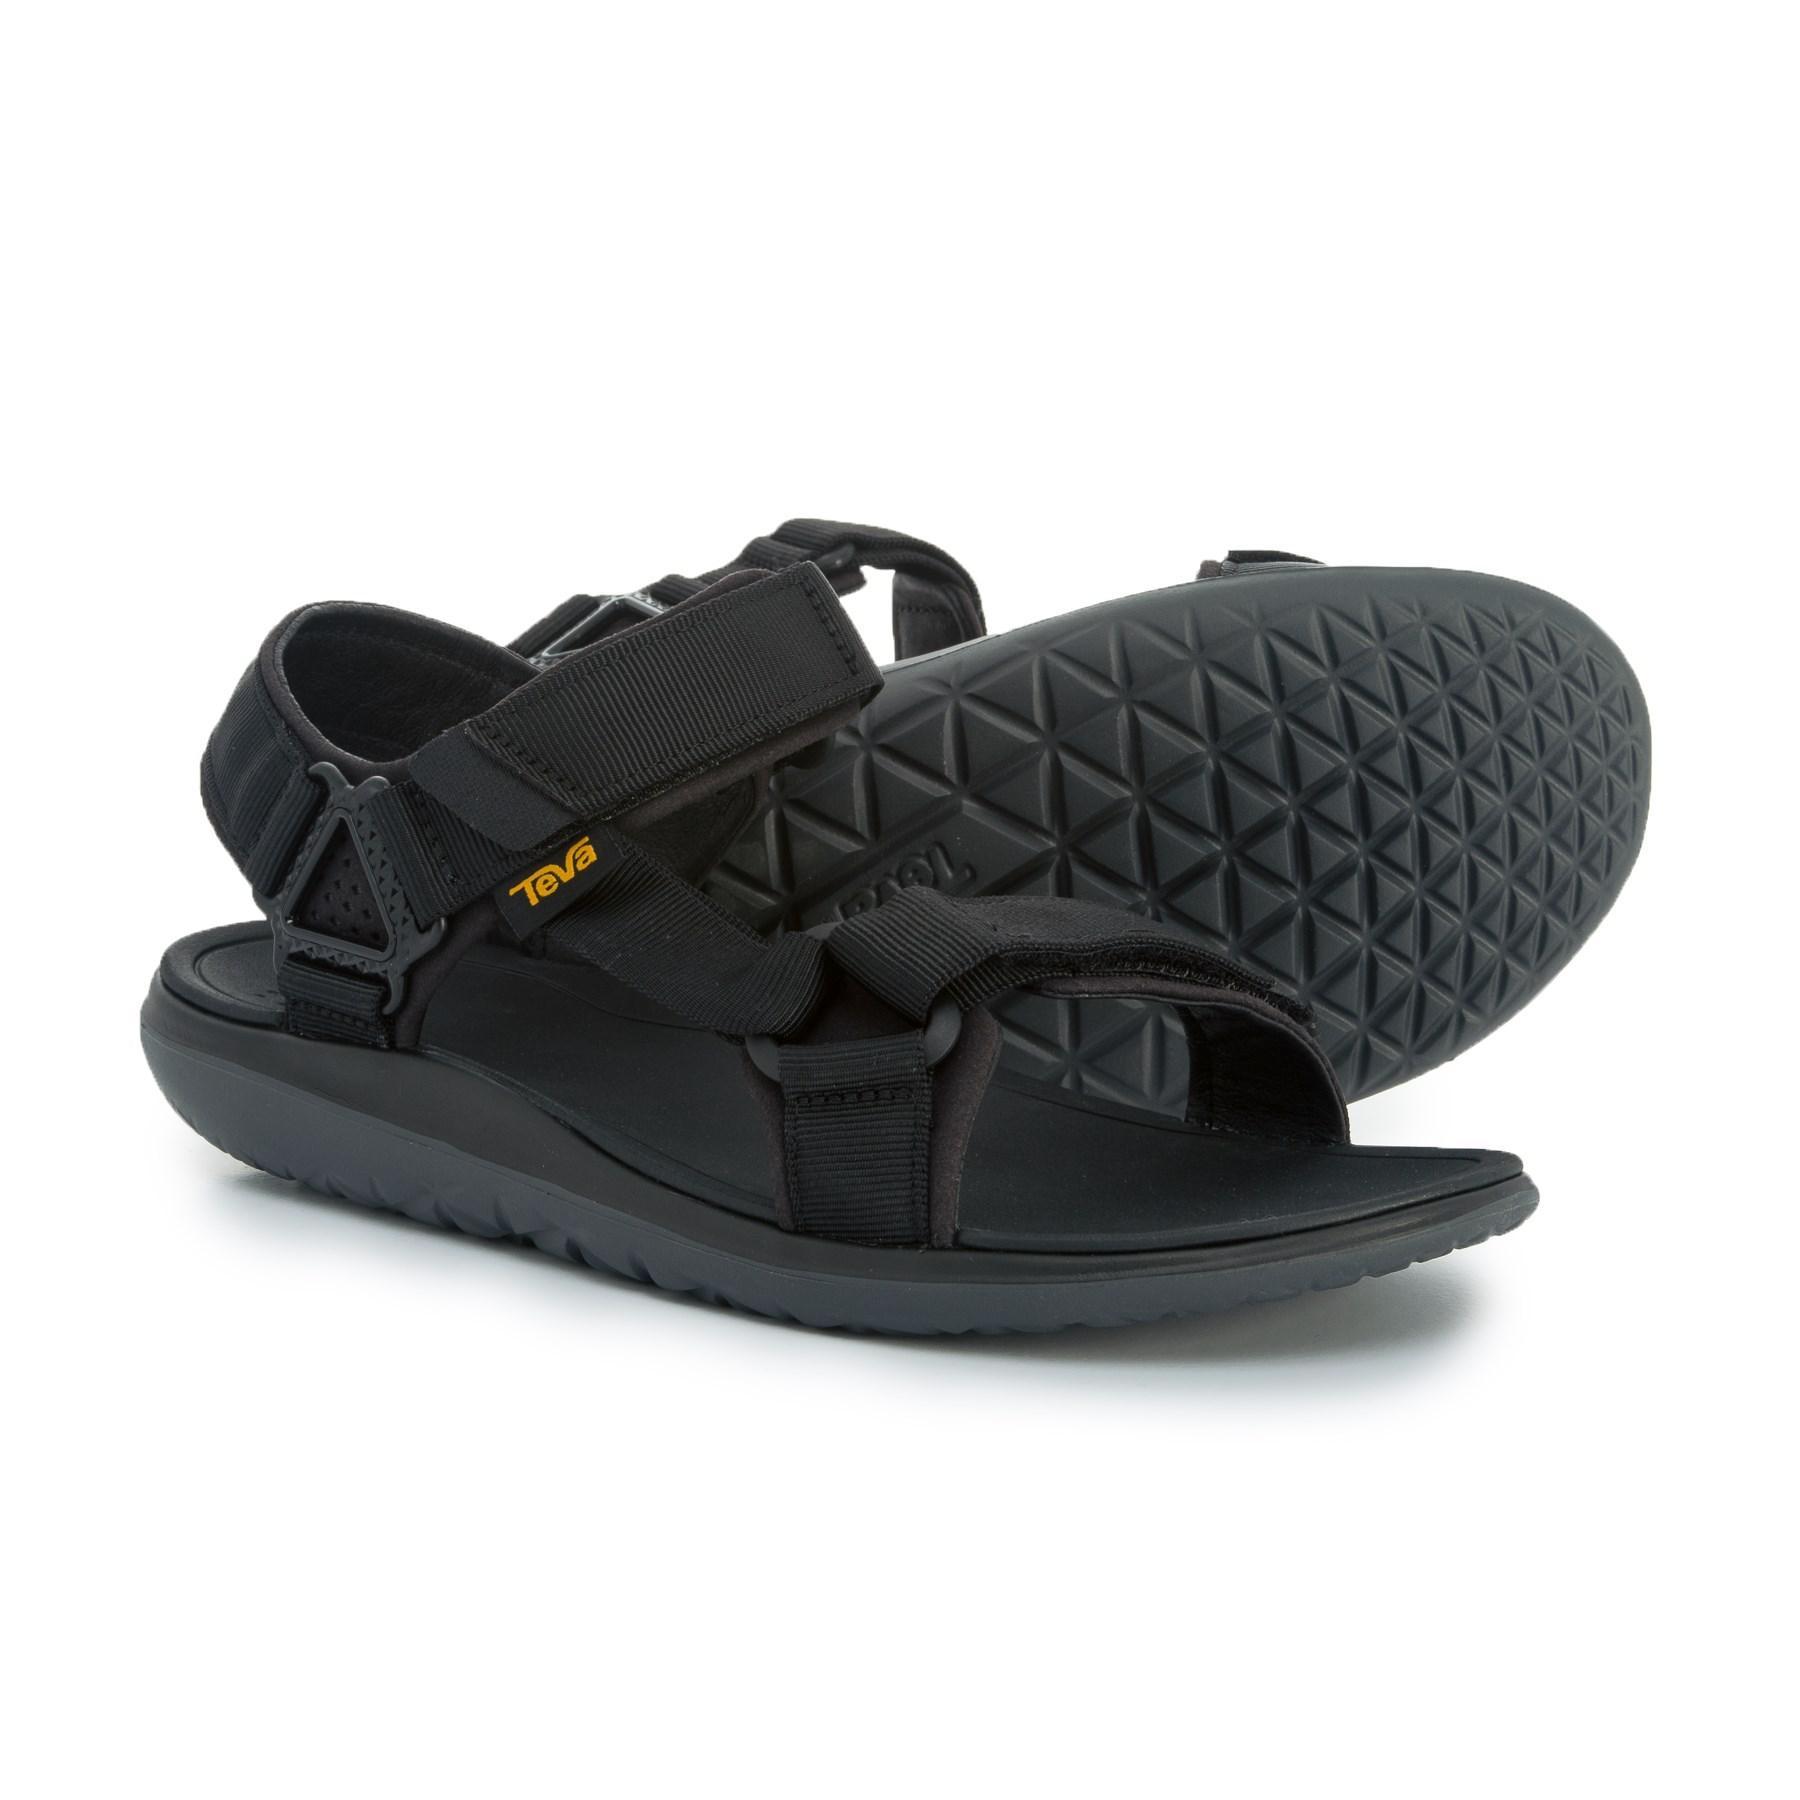 55c6f40a5284 Lyst - Teva Terra-float Universal 2.0 Sport Sandals (for Men) in ...